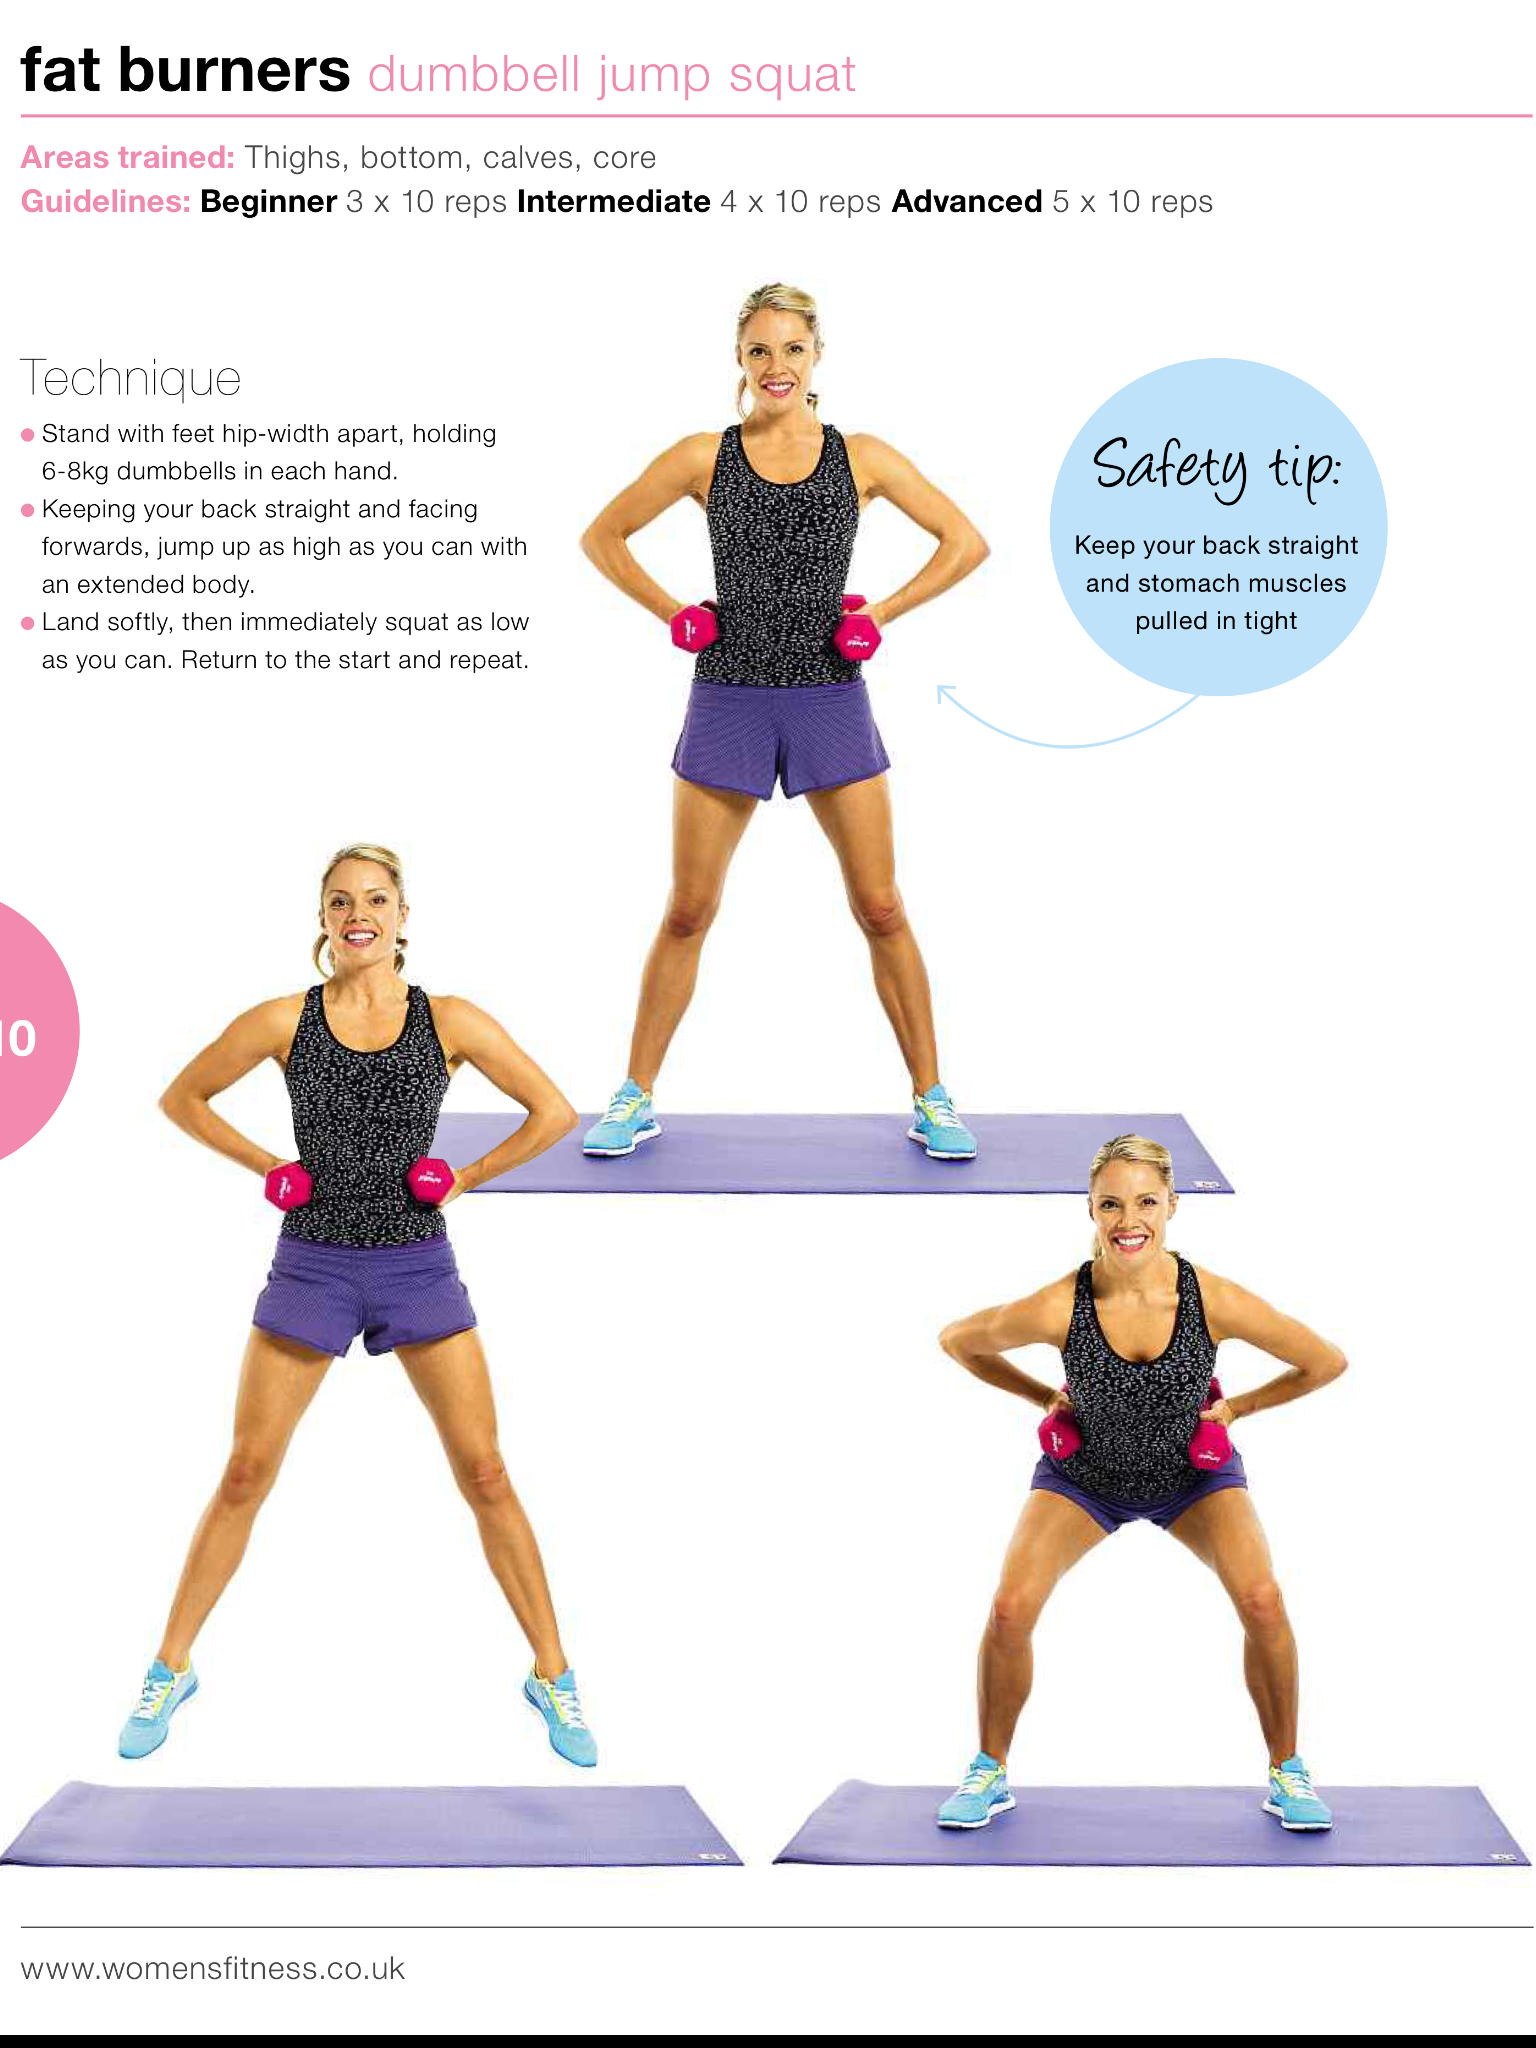 Gym Safety Safety tips, Gym, Tips